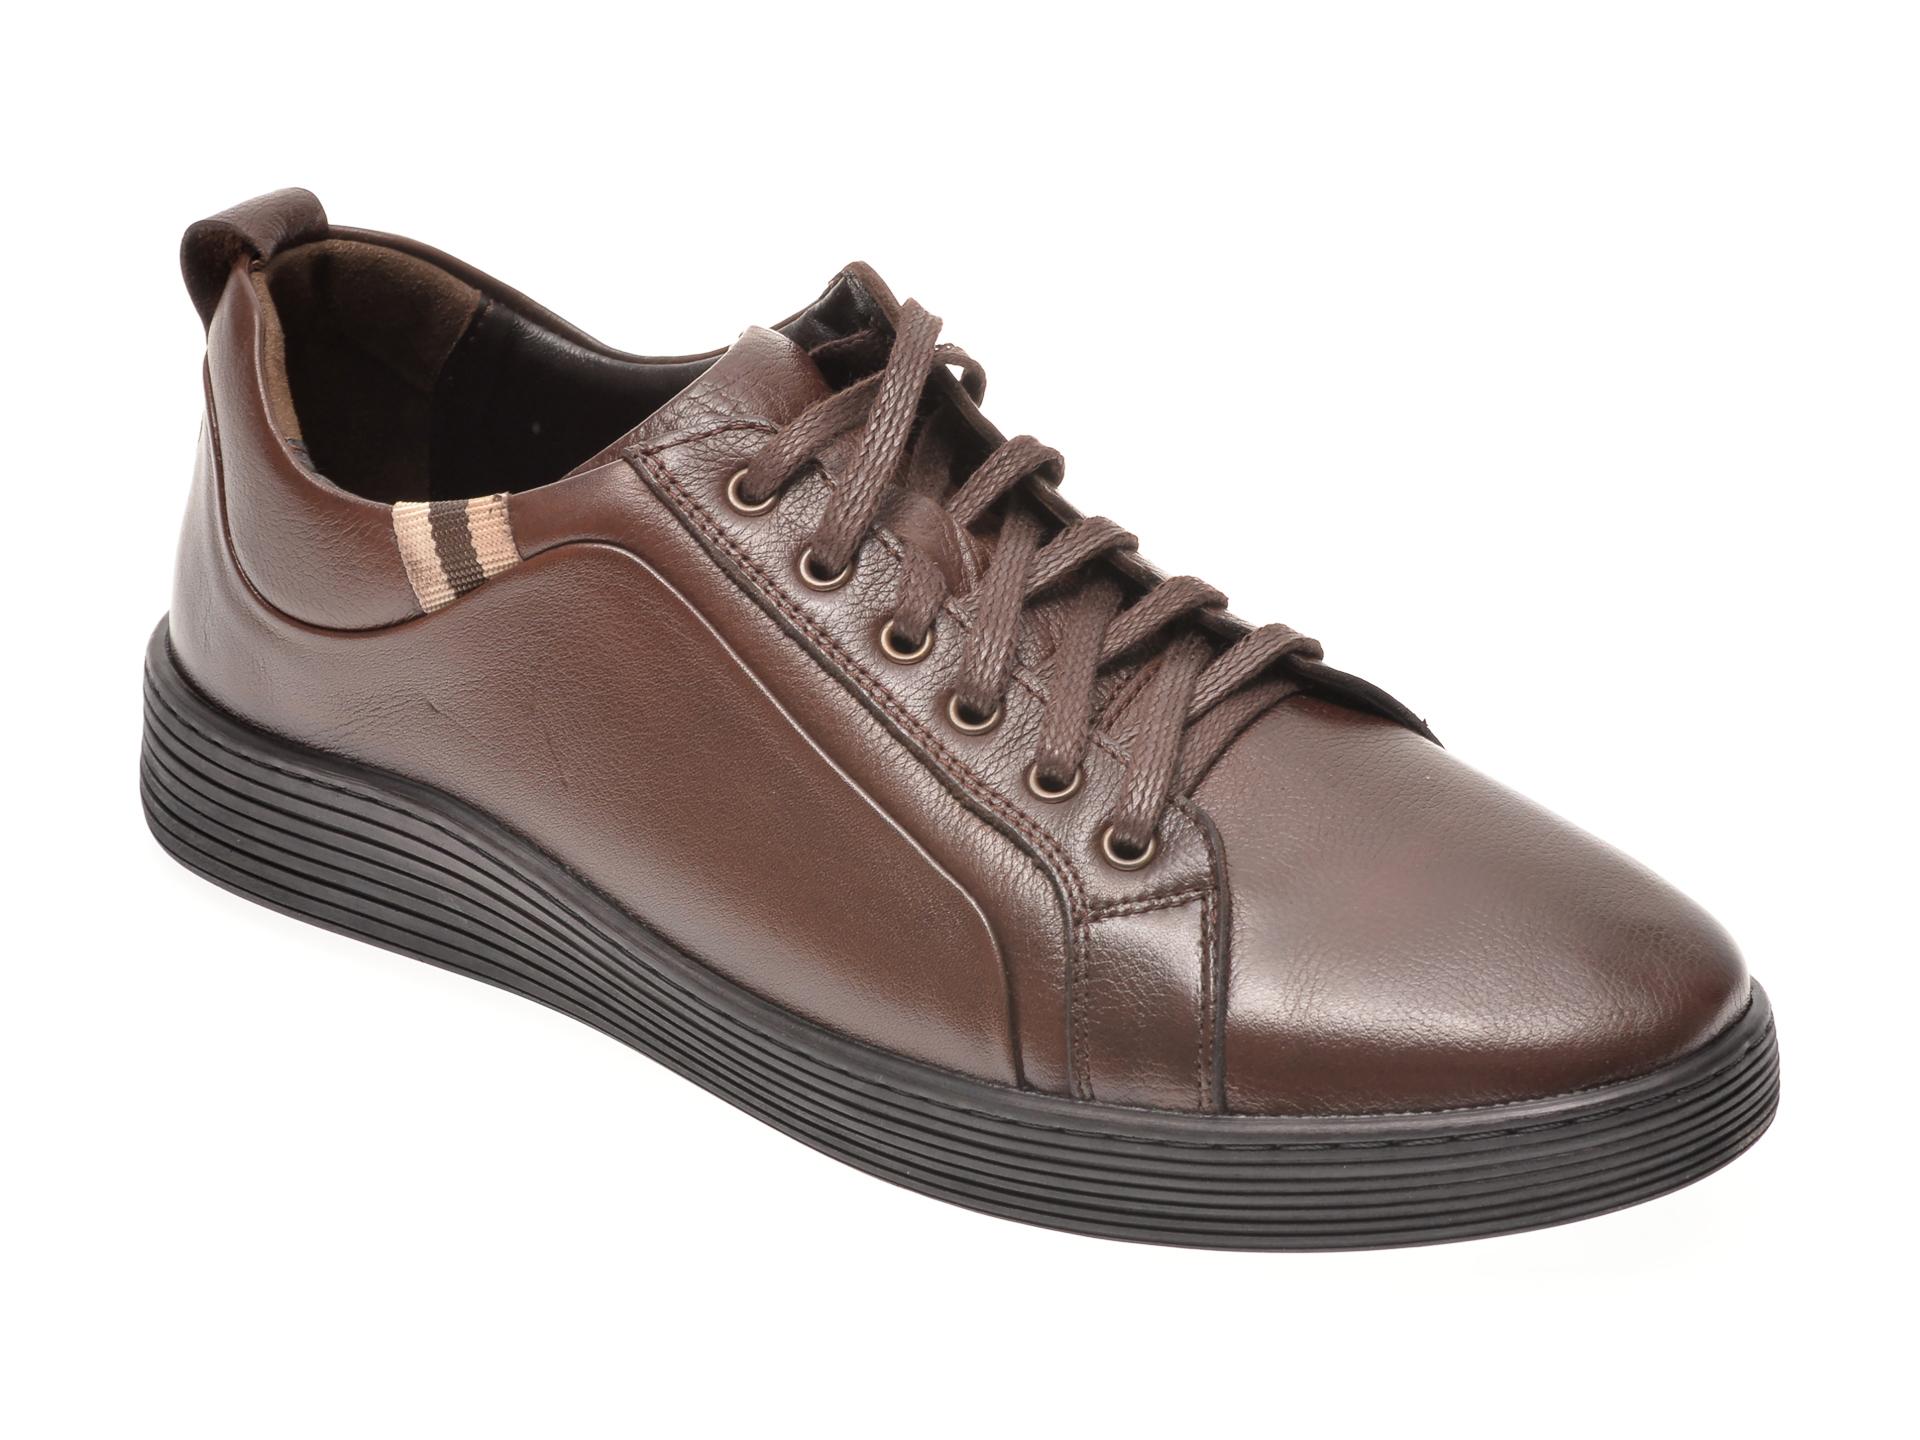 Pantofi OTTER maro, 871, din piele naturala imagine